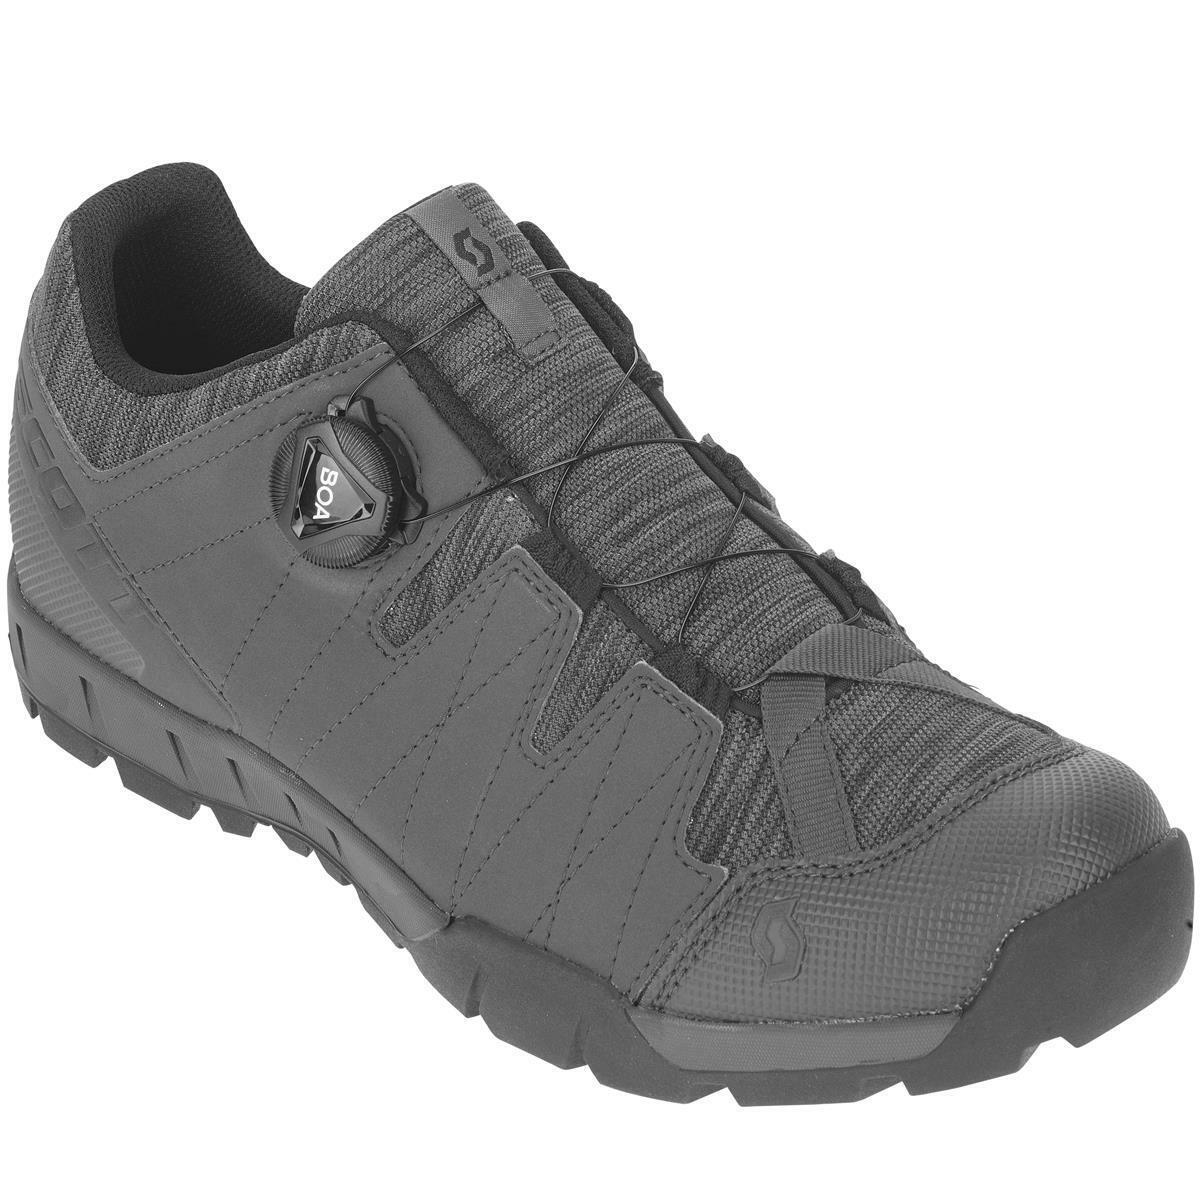 SCOTT Sport Trail Boa - dark grau schwarz